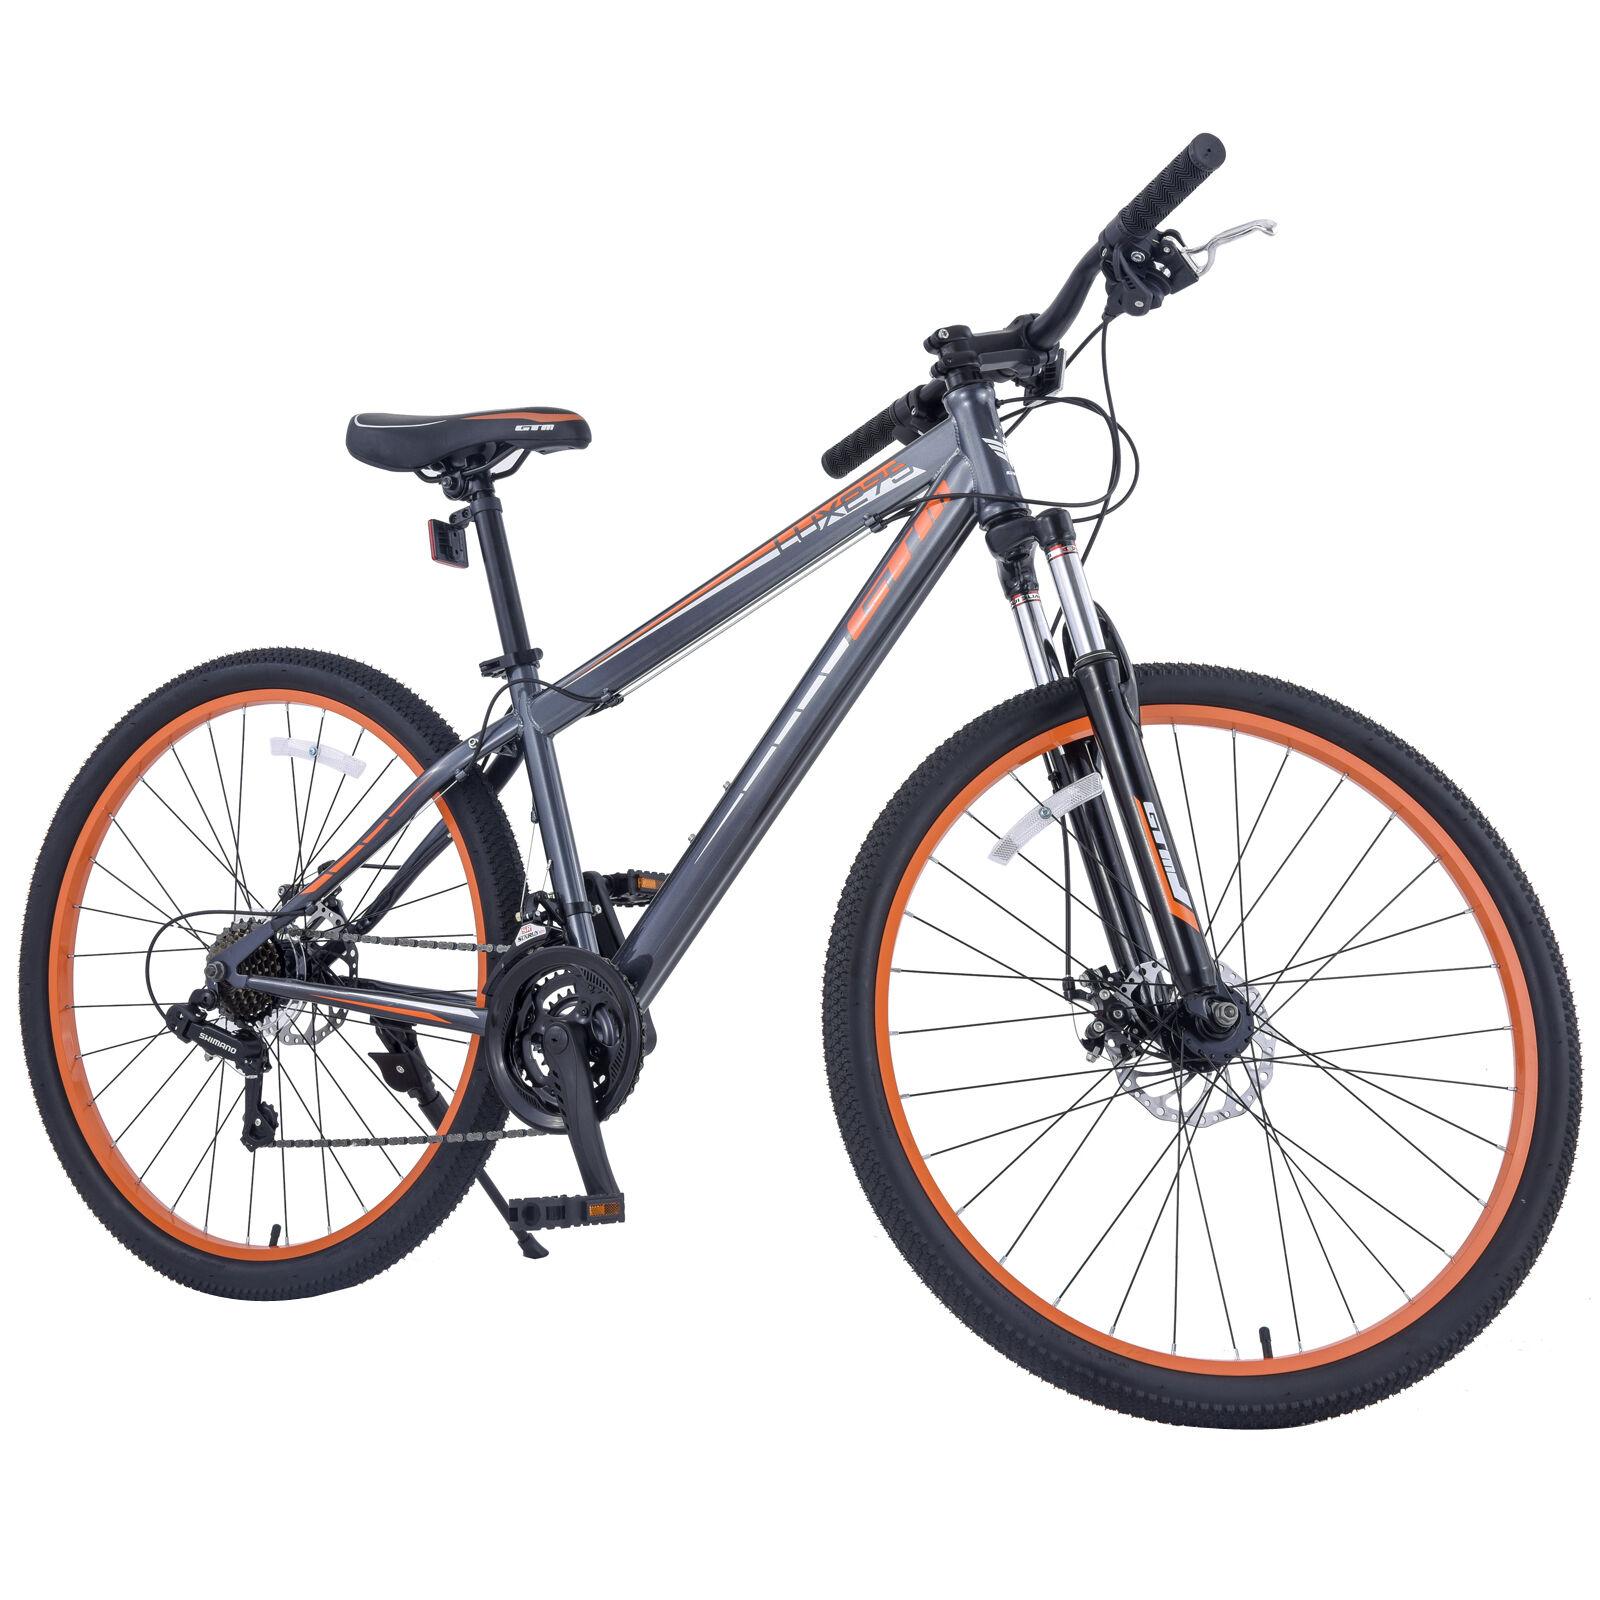 Shimano 21 Speed Mountain Bike